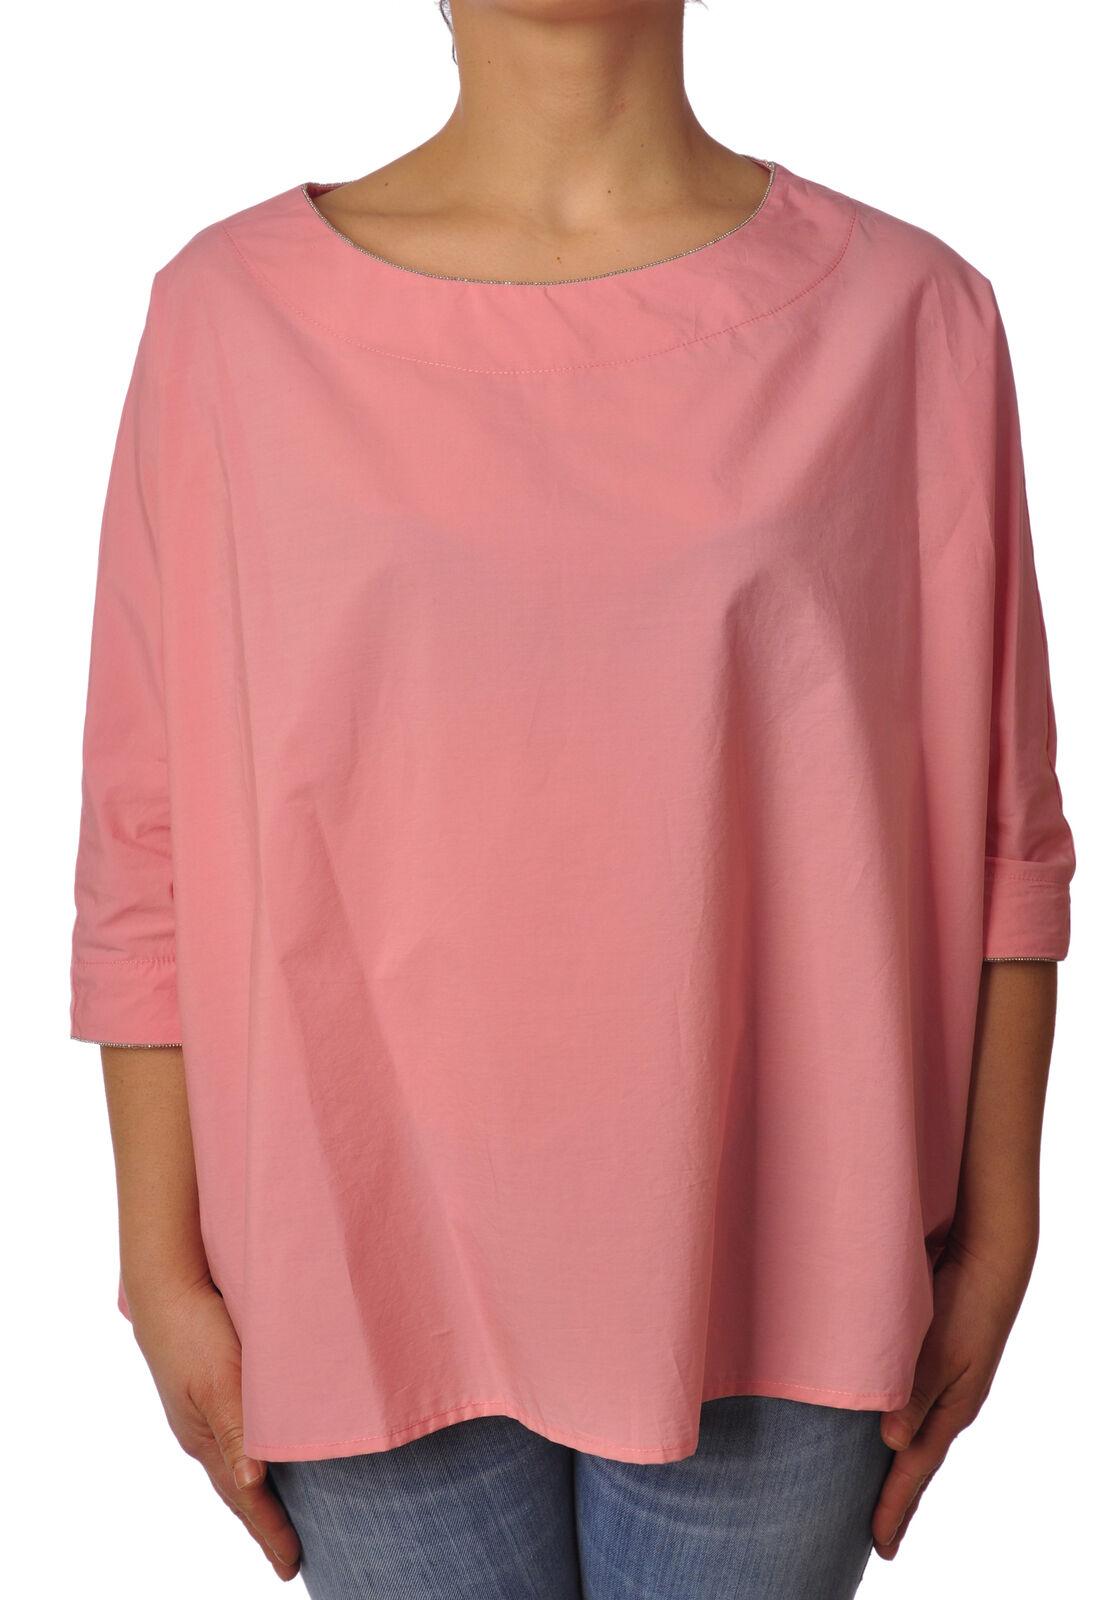 Ottod'ame - Shirts-Shirt - Woman - Rosa - 4953223B180941